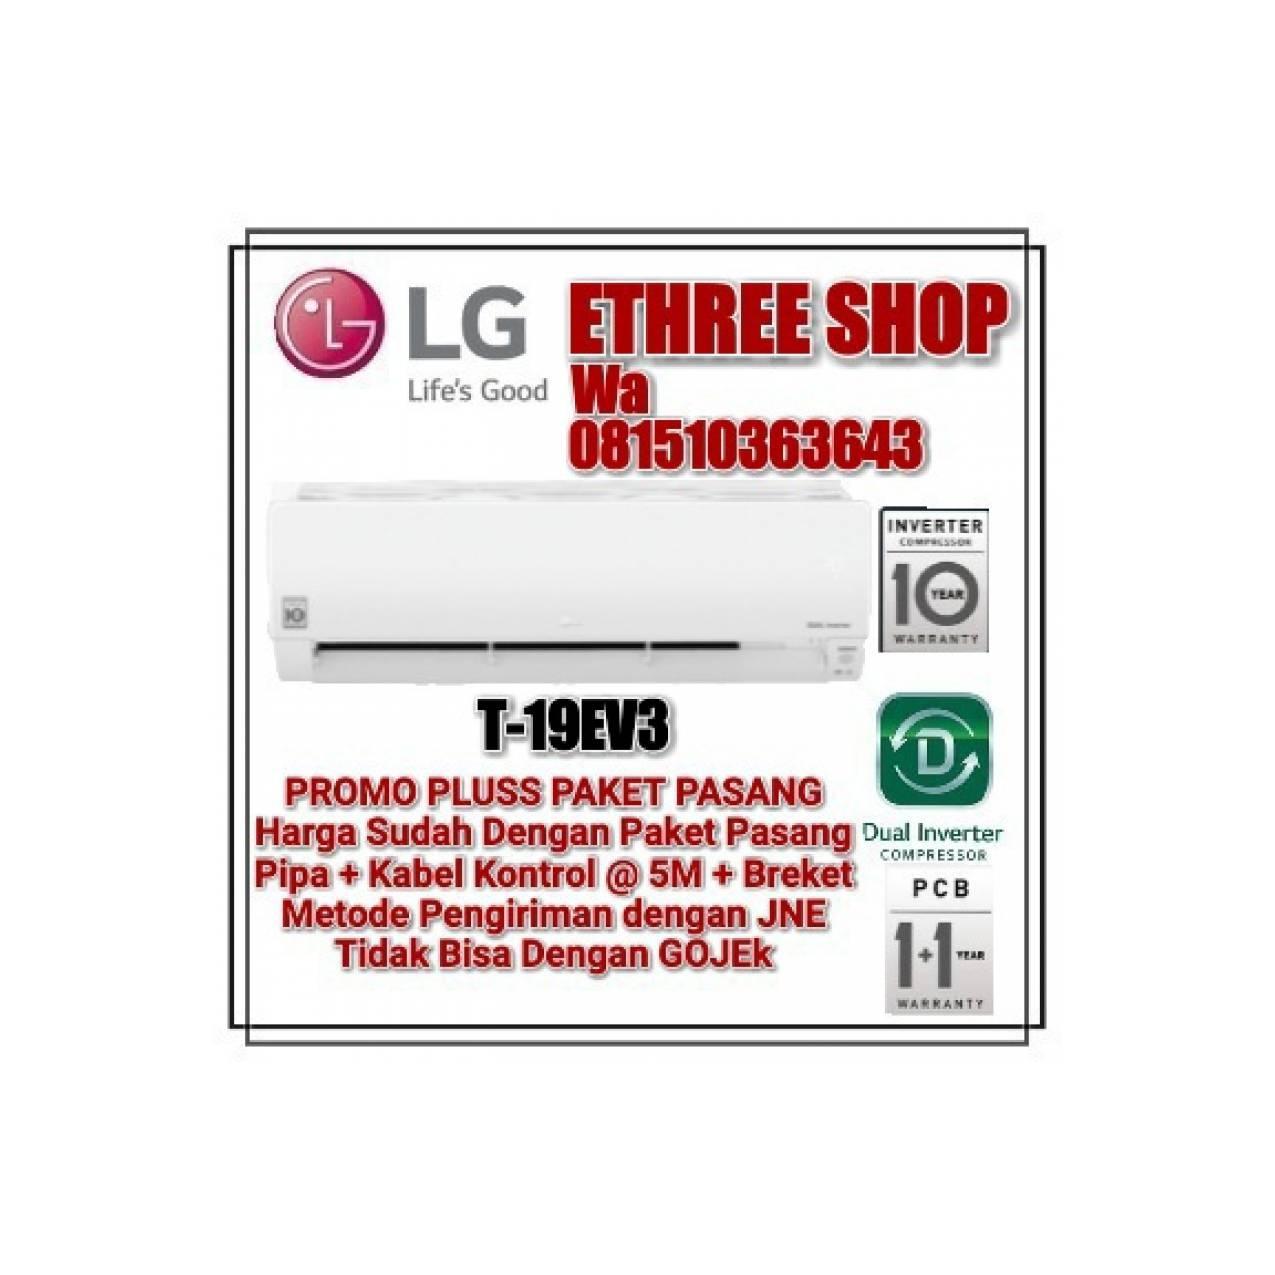 LG T-19EV3 - AC DUAL INVERTER SMART 2 PK - FREON R32 - MURAH